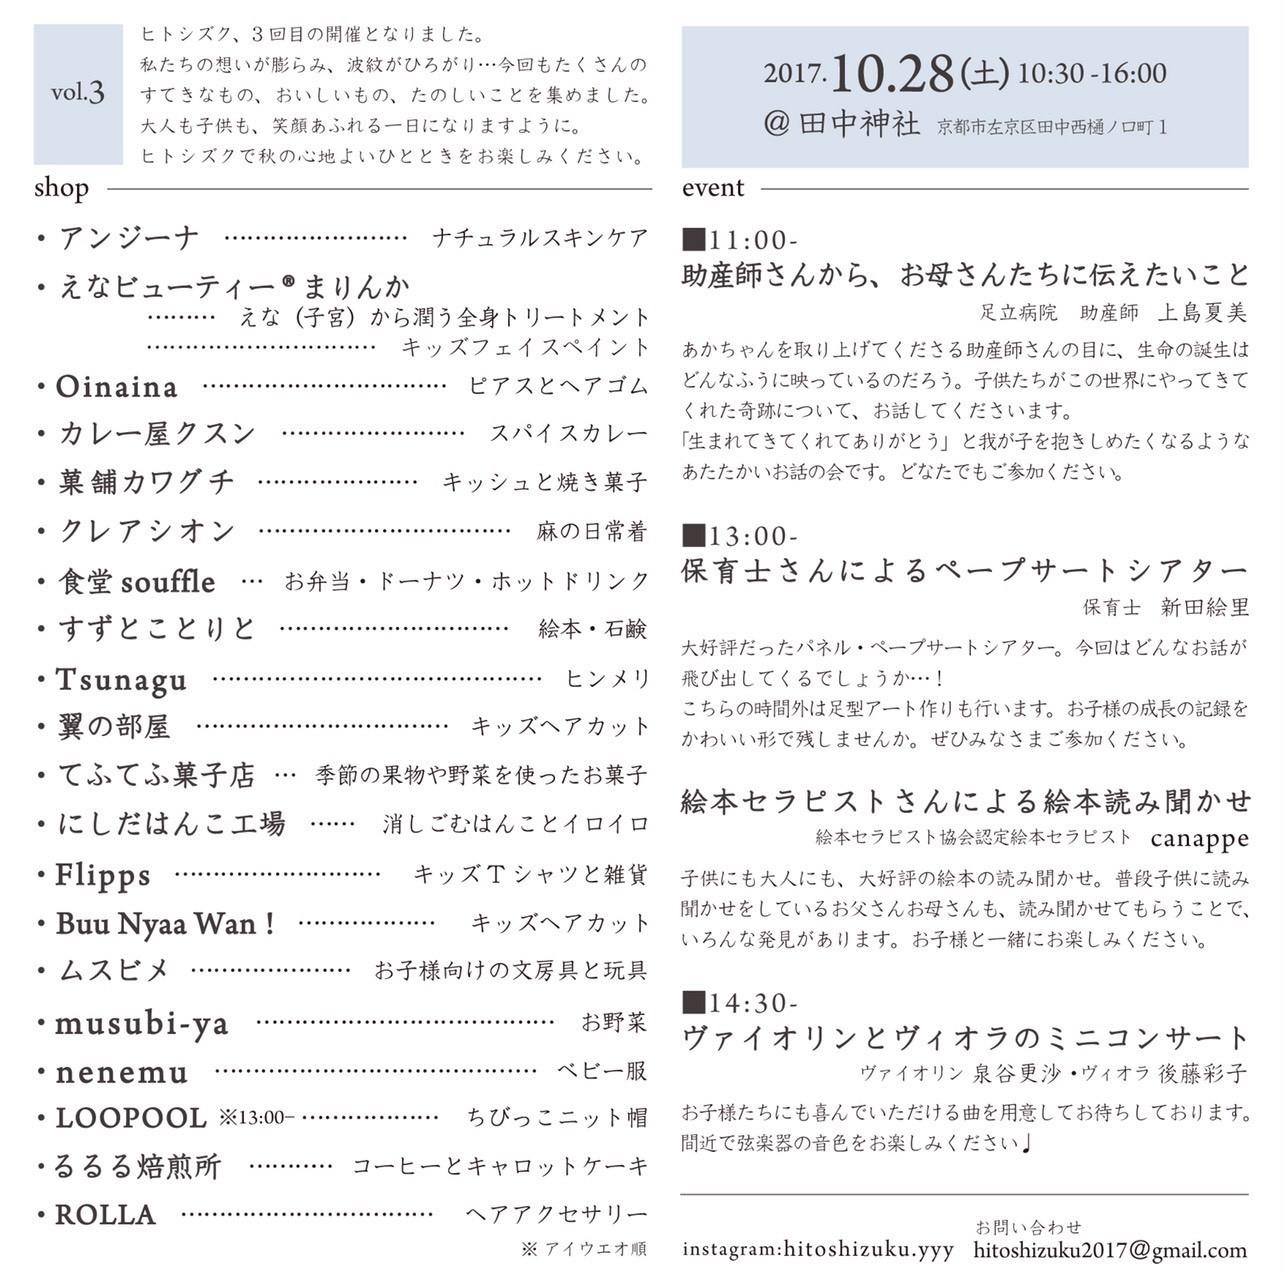 S__72245258.jpg